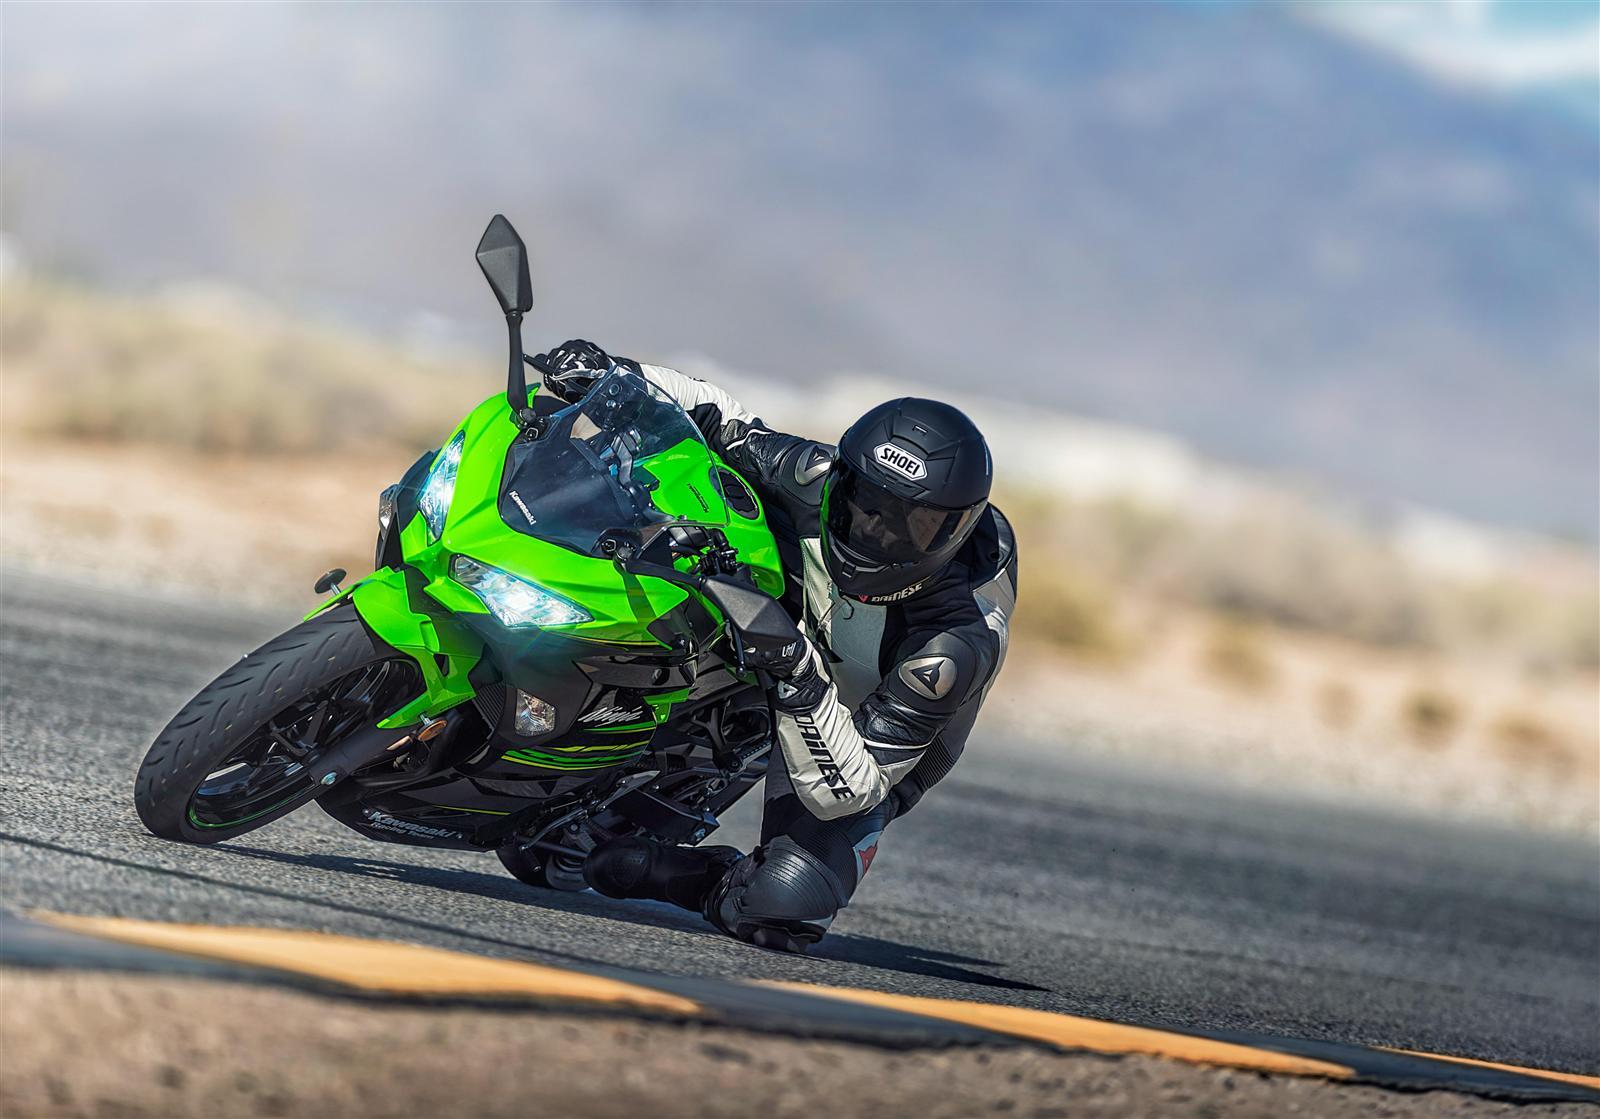 Kawasaki Ninja 400 wyścigowy